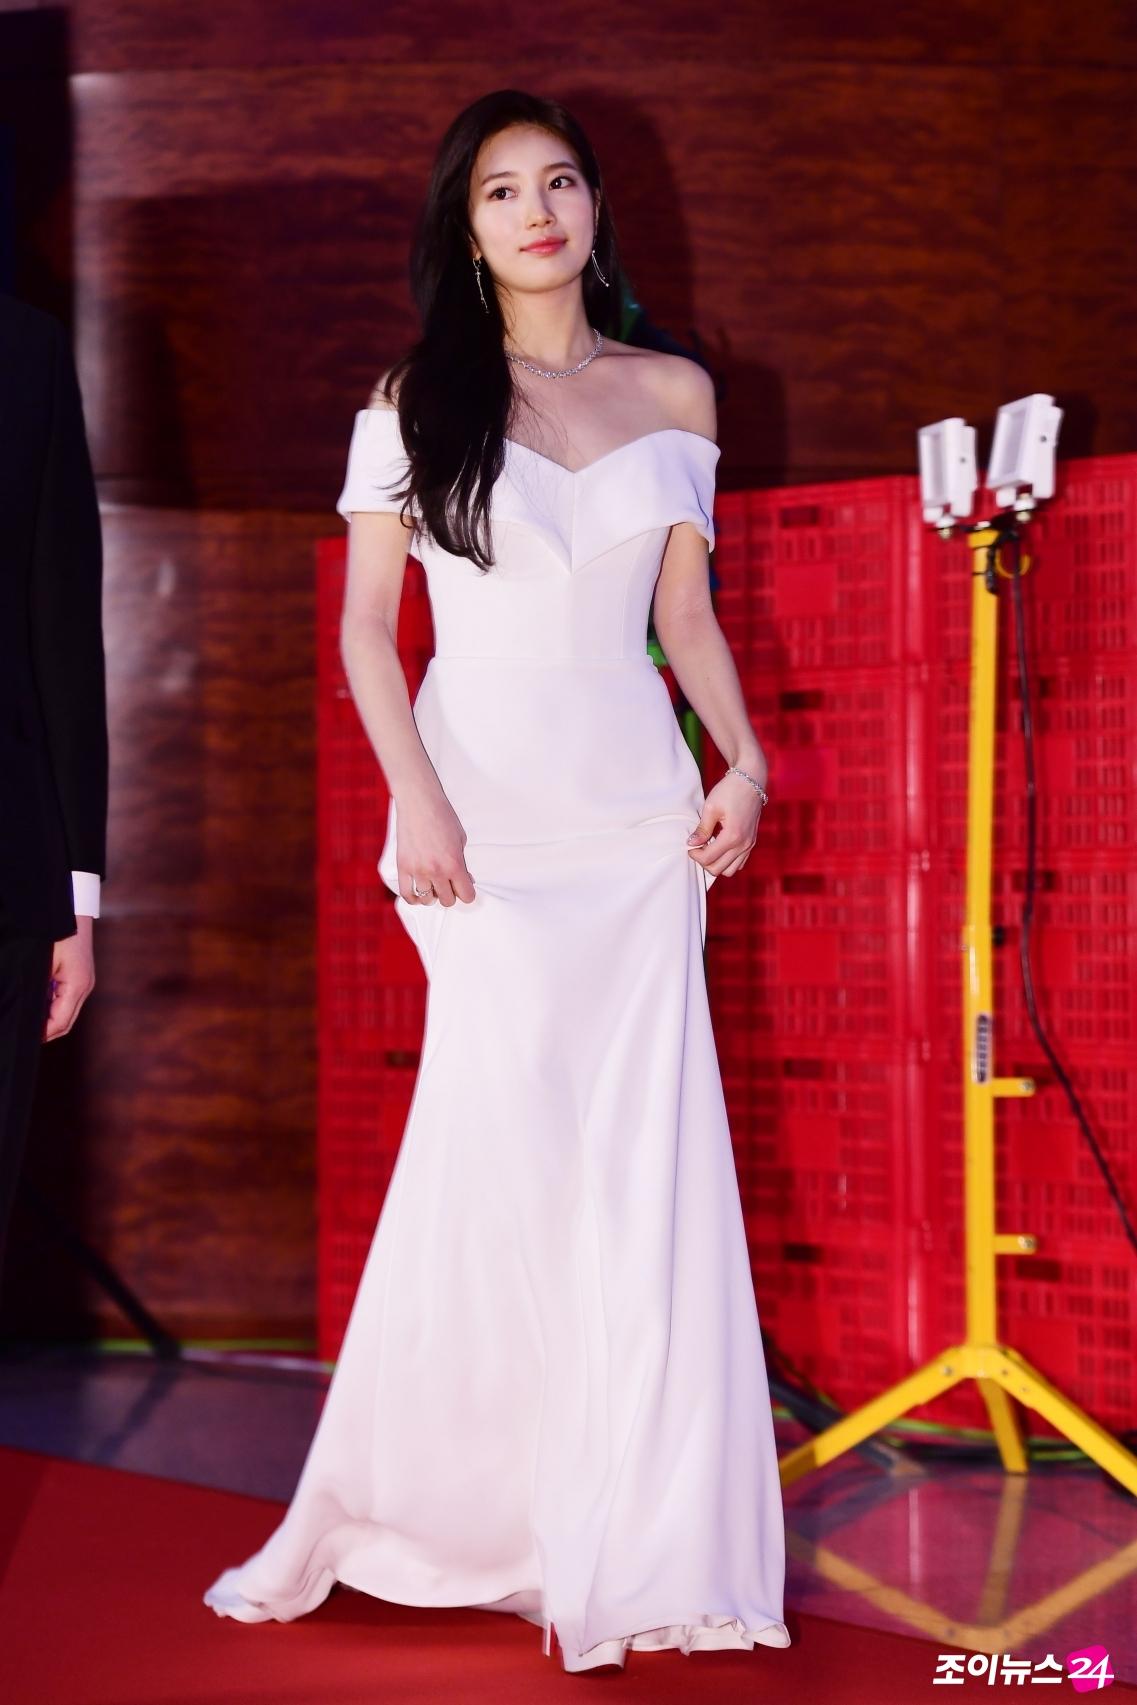 807f1458fe4 15 Best Dressed Idols At The 54th Baeksang Arts Awards Red Carpet